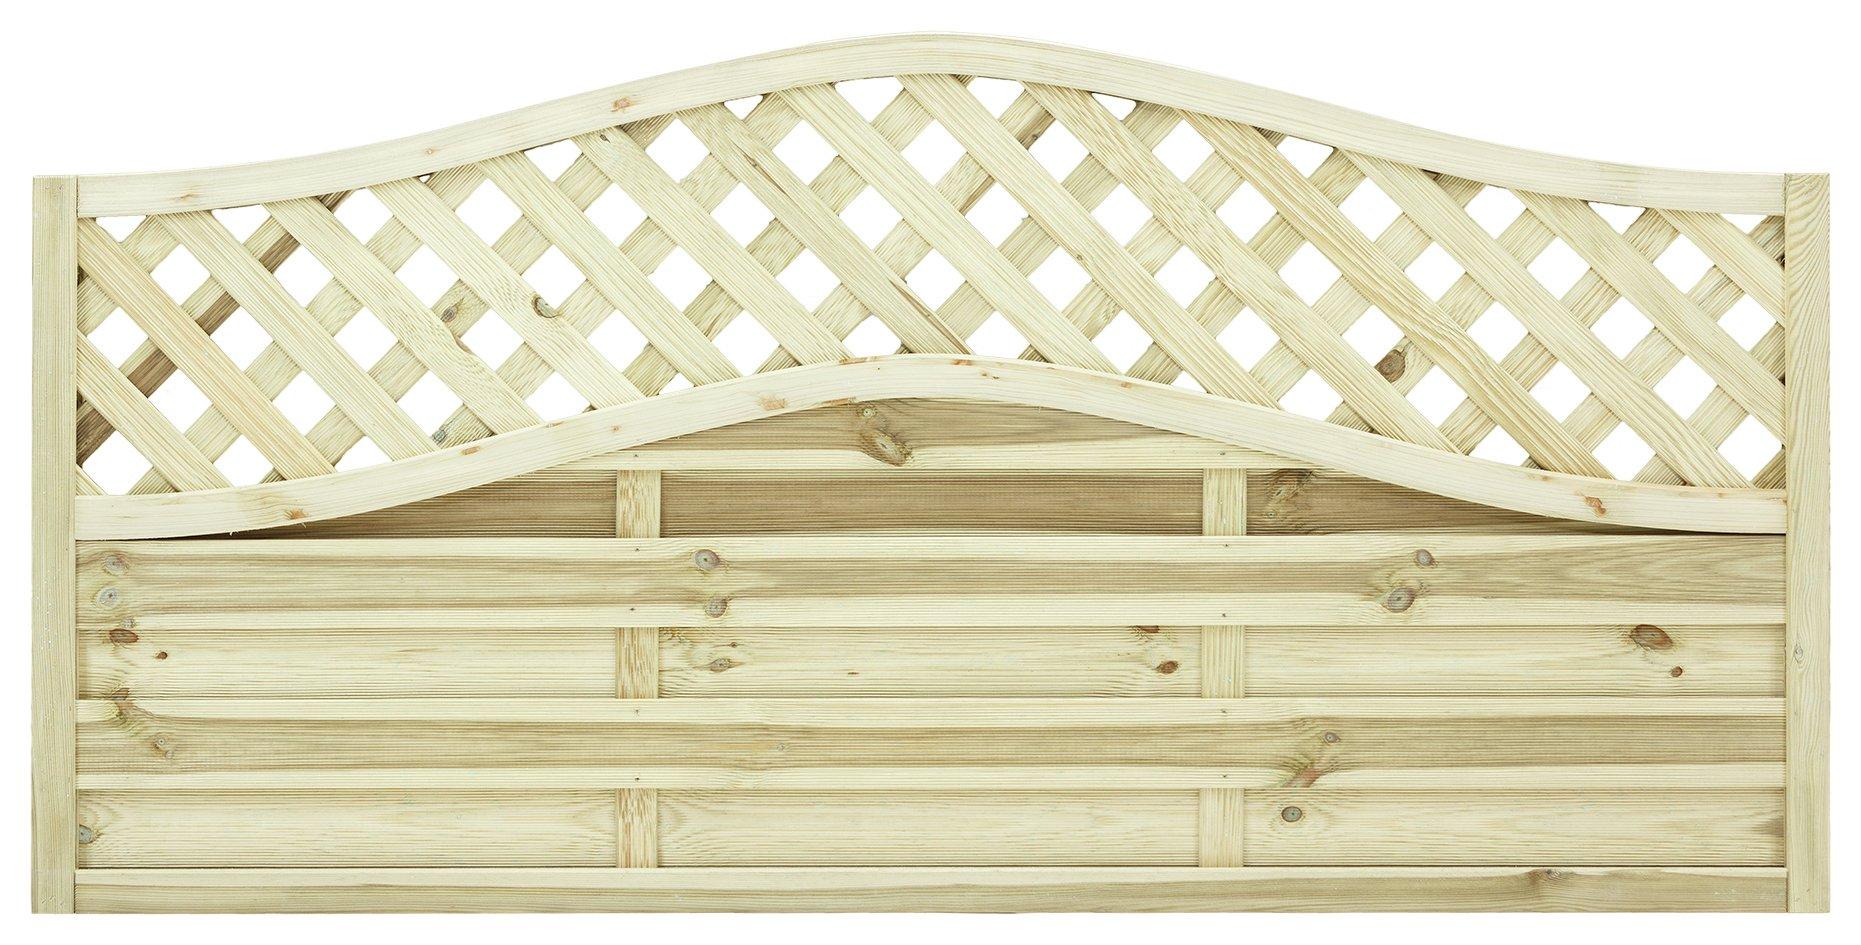 Grange Elite St Meloir 0.9m Fence Panel - Pack of 5. lowest price